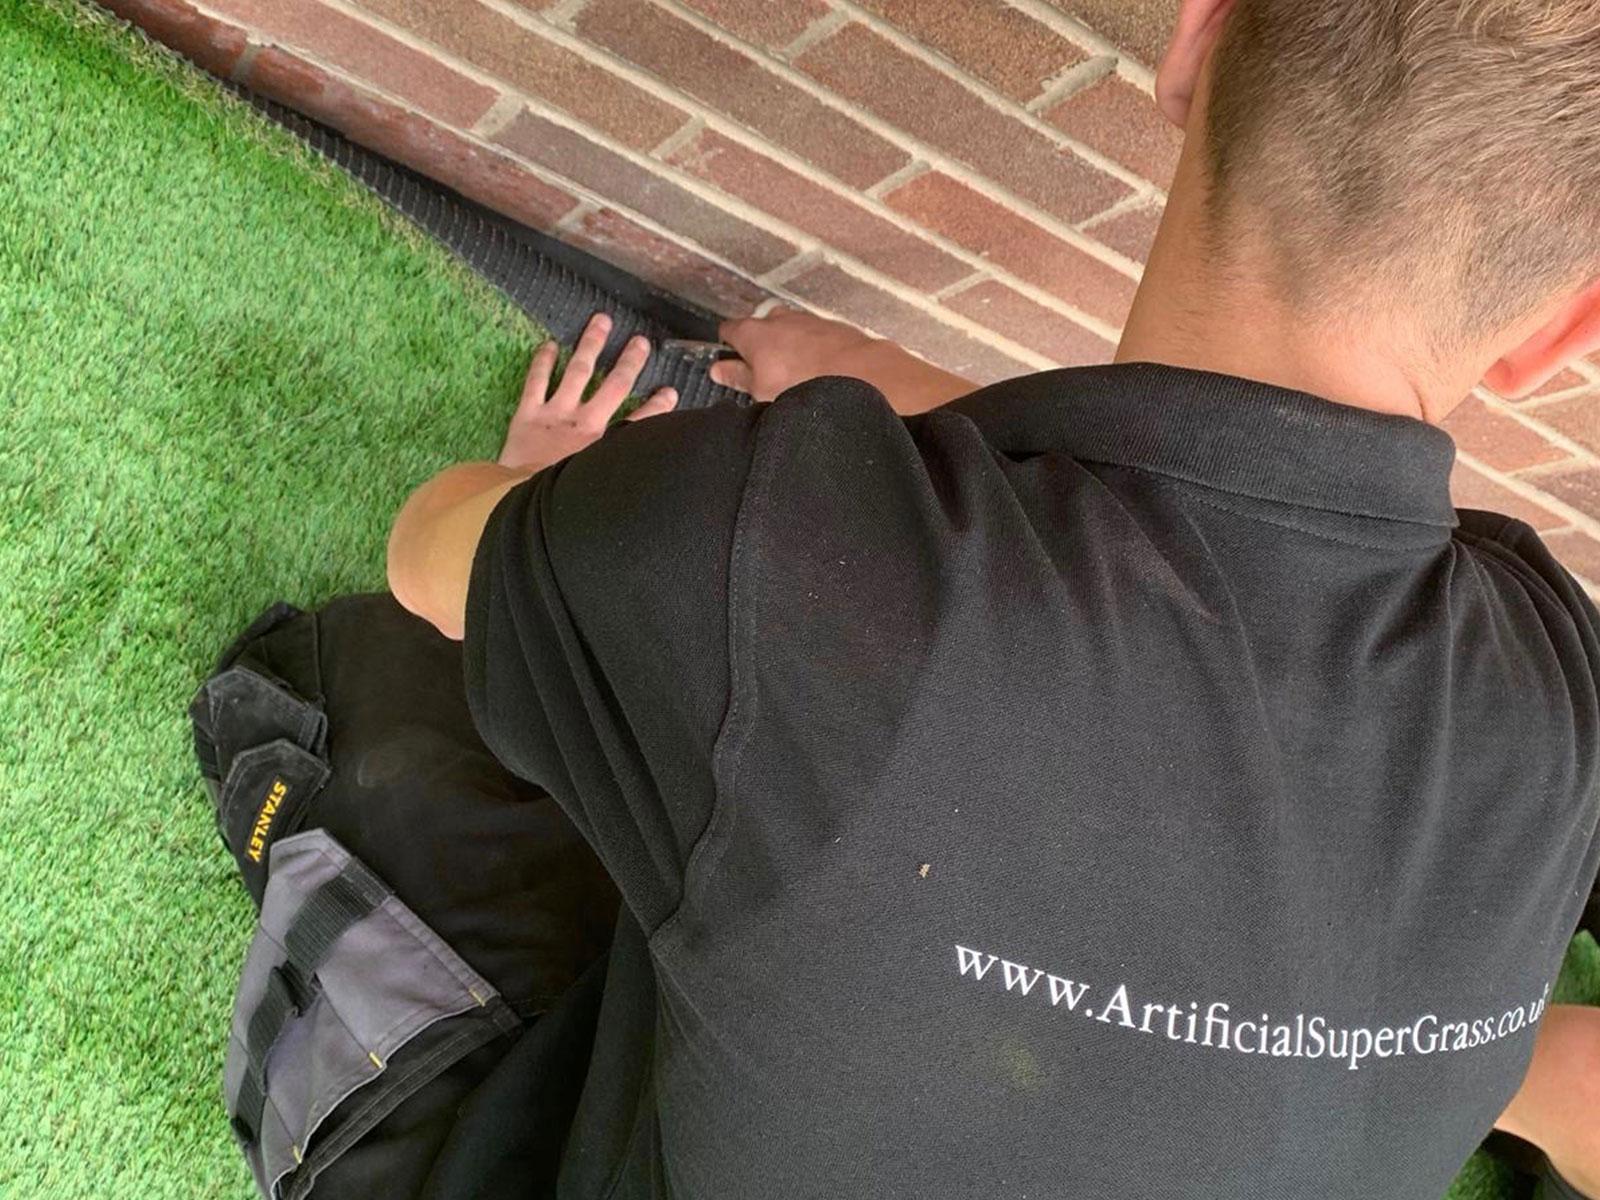 Astro Turf Horsforth Artificial Super Grass